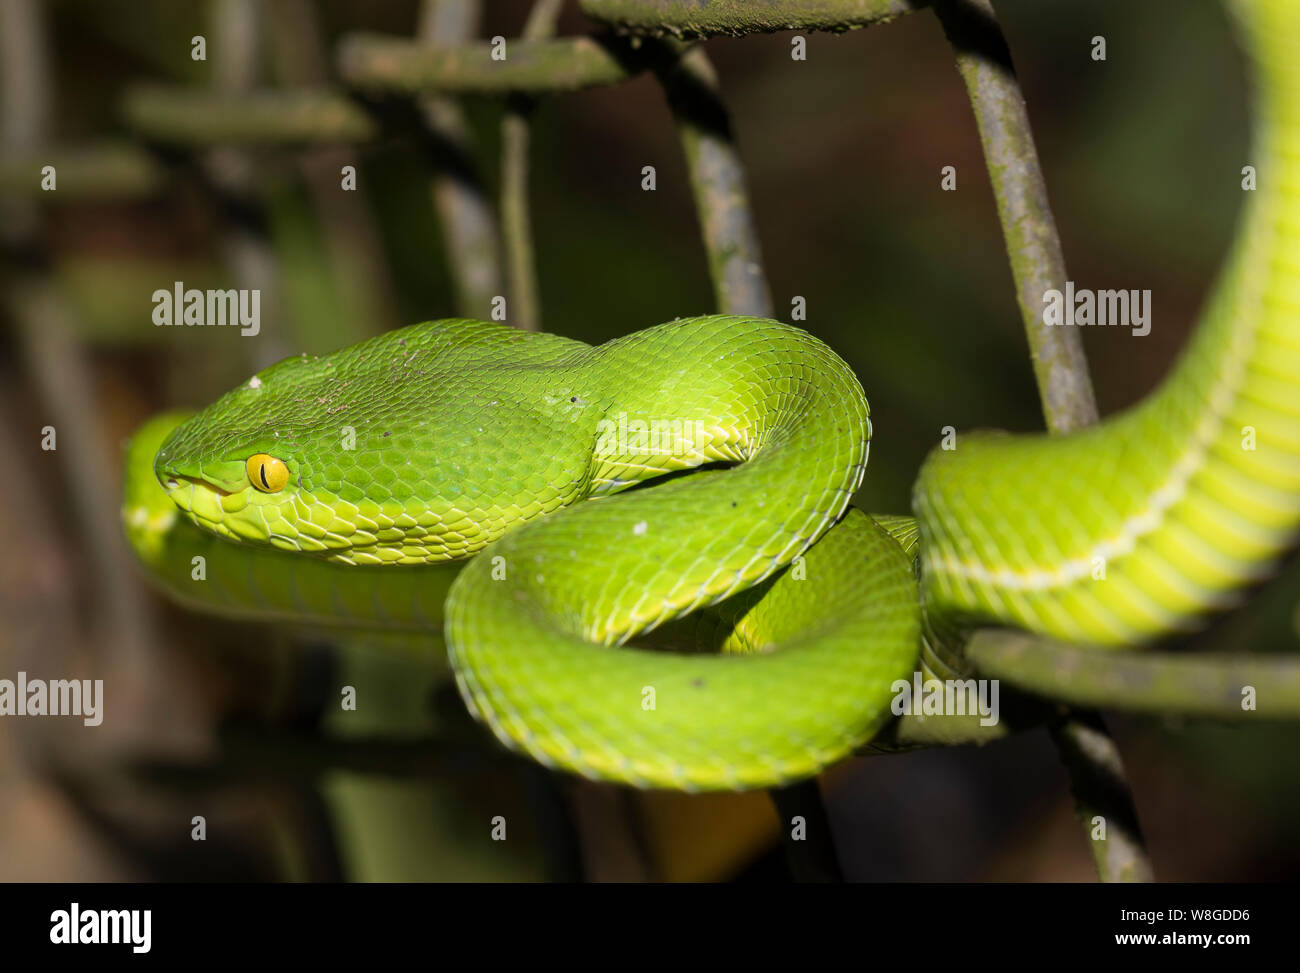 Cerrar Foto de un White-Lipped pit viper (Trimeresurus albolabris) enrollados en Tailandia Foto de stock